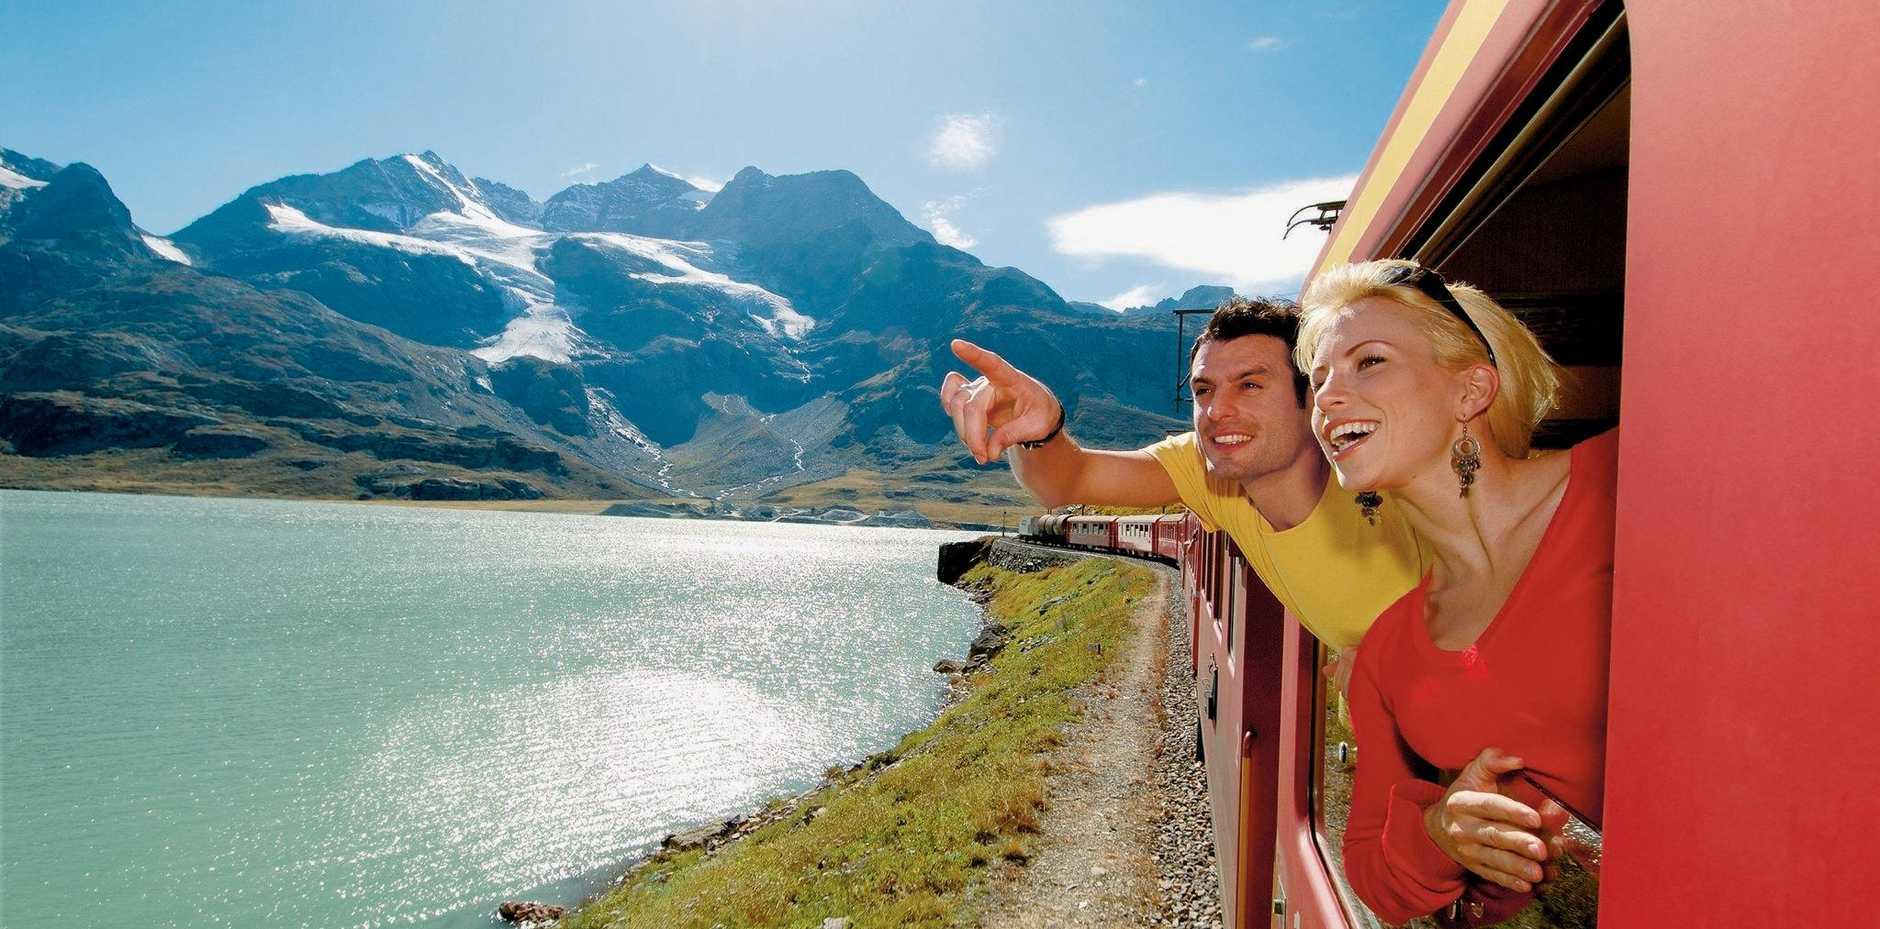 ABOVE: A rail journey through Switzerland makes a unique experience.